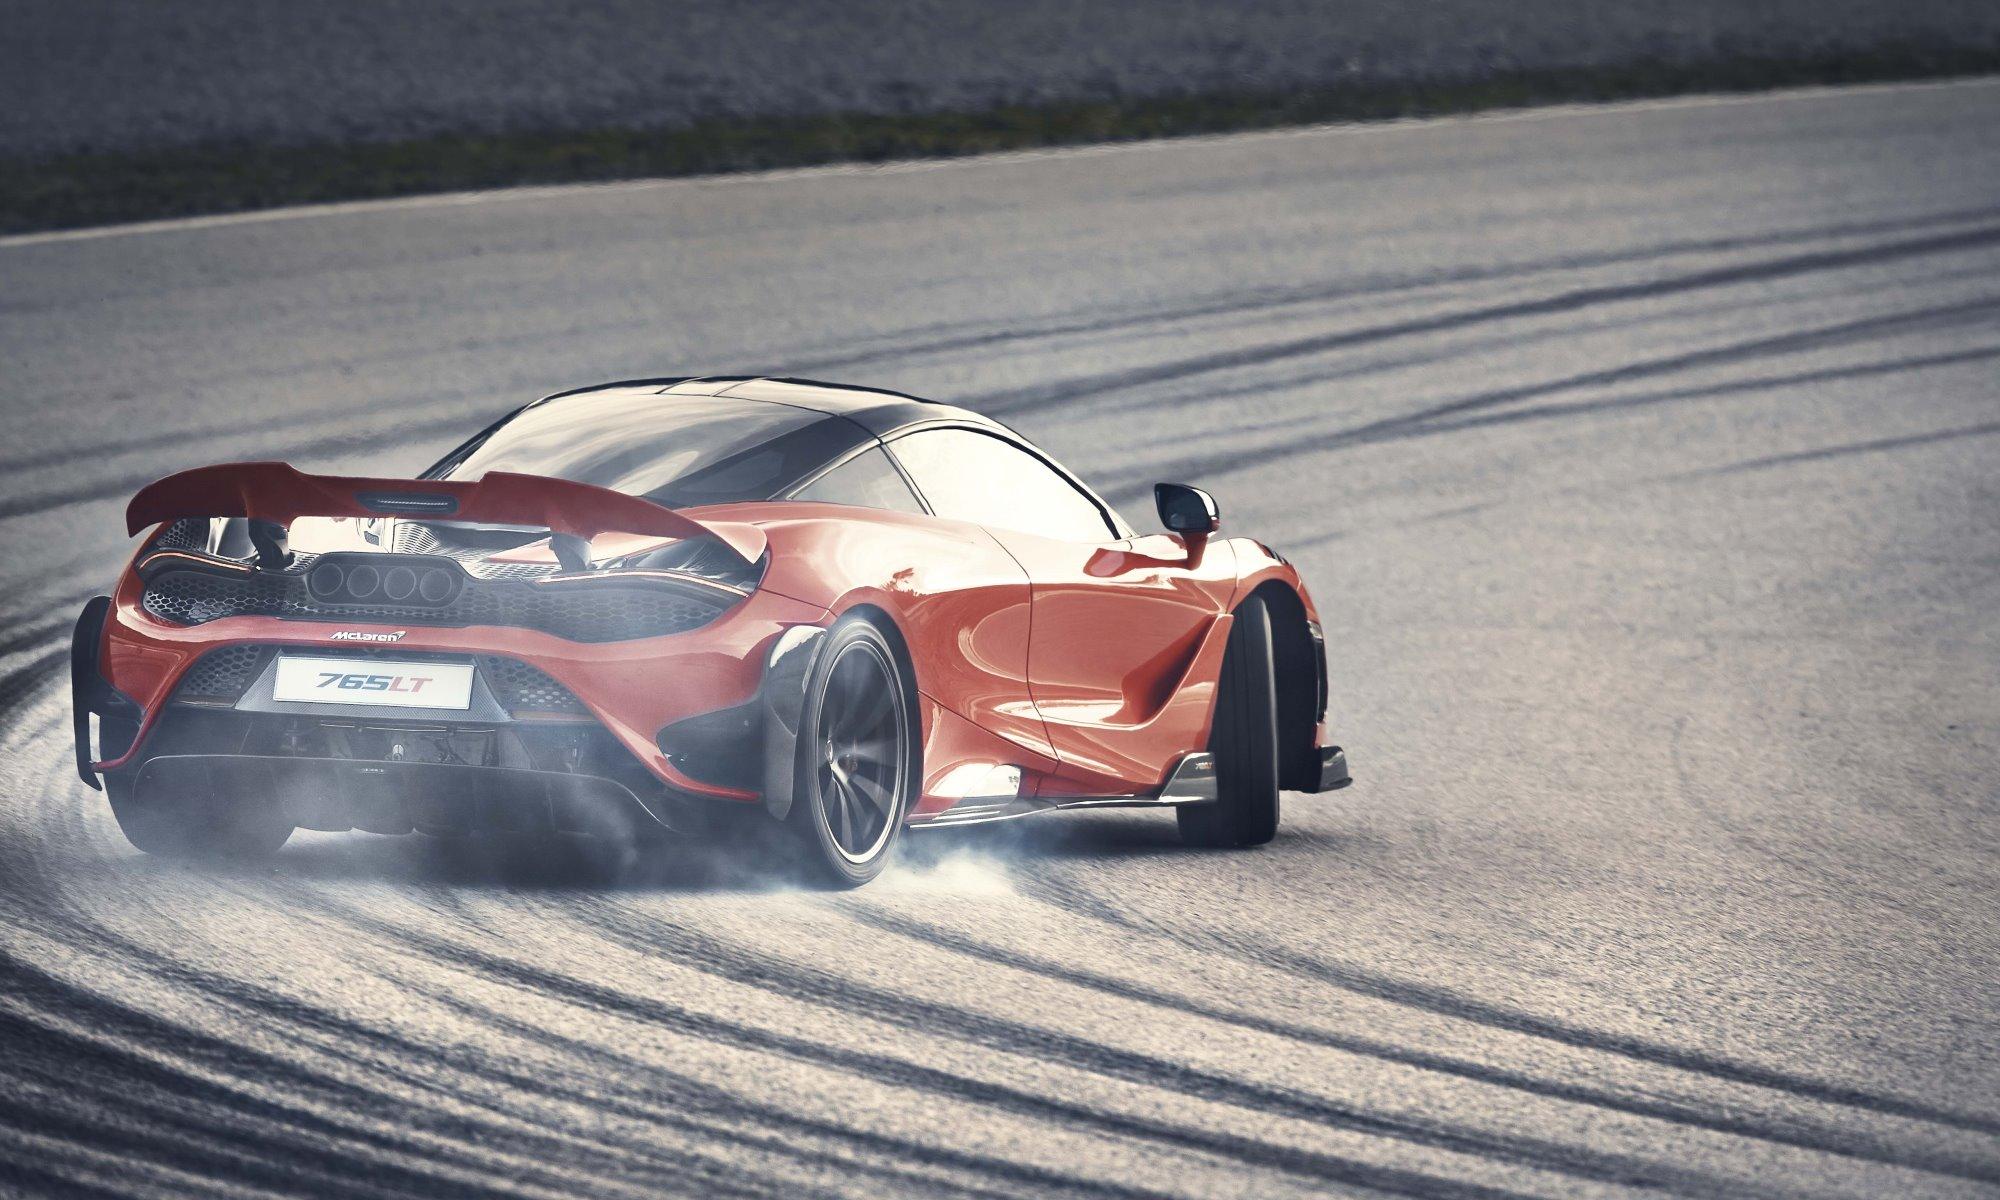 McLaren 765LT sideways rear